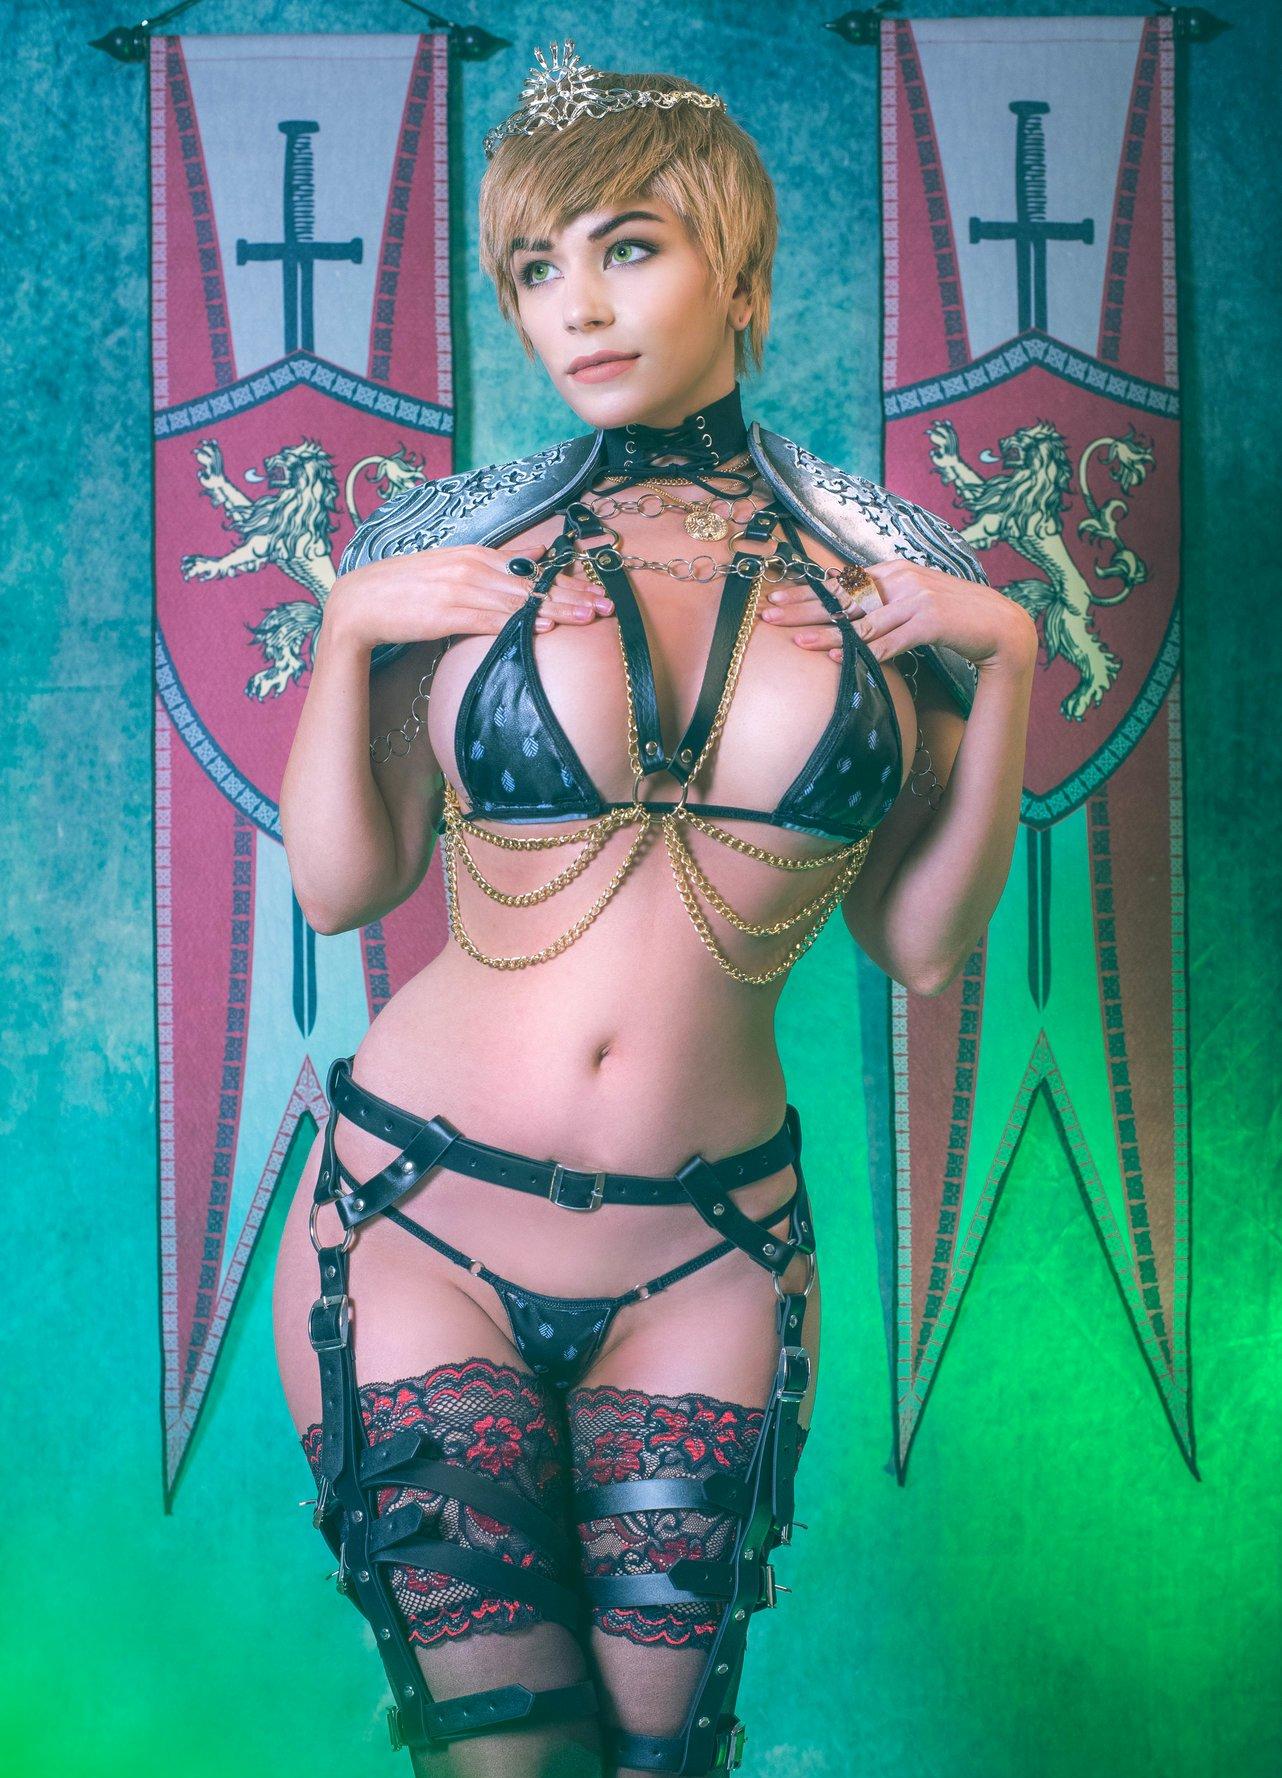 Danielle Beaulieu Daniellecosplay Onlyfans Nude Leaks 0026